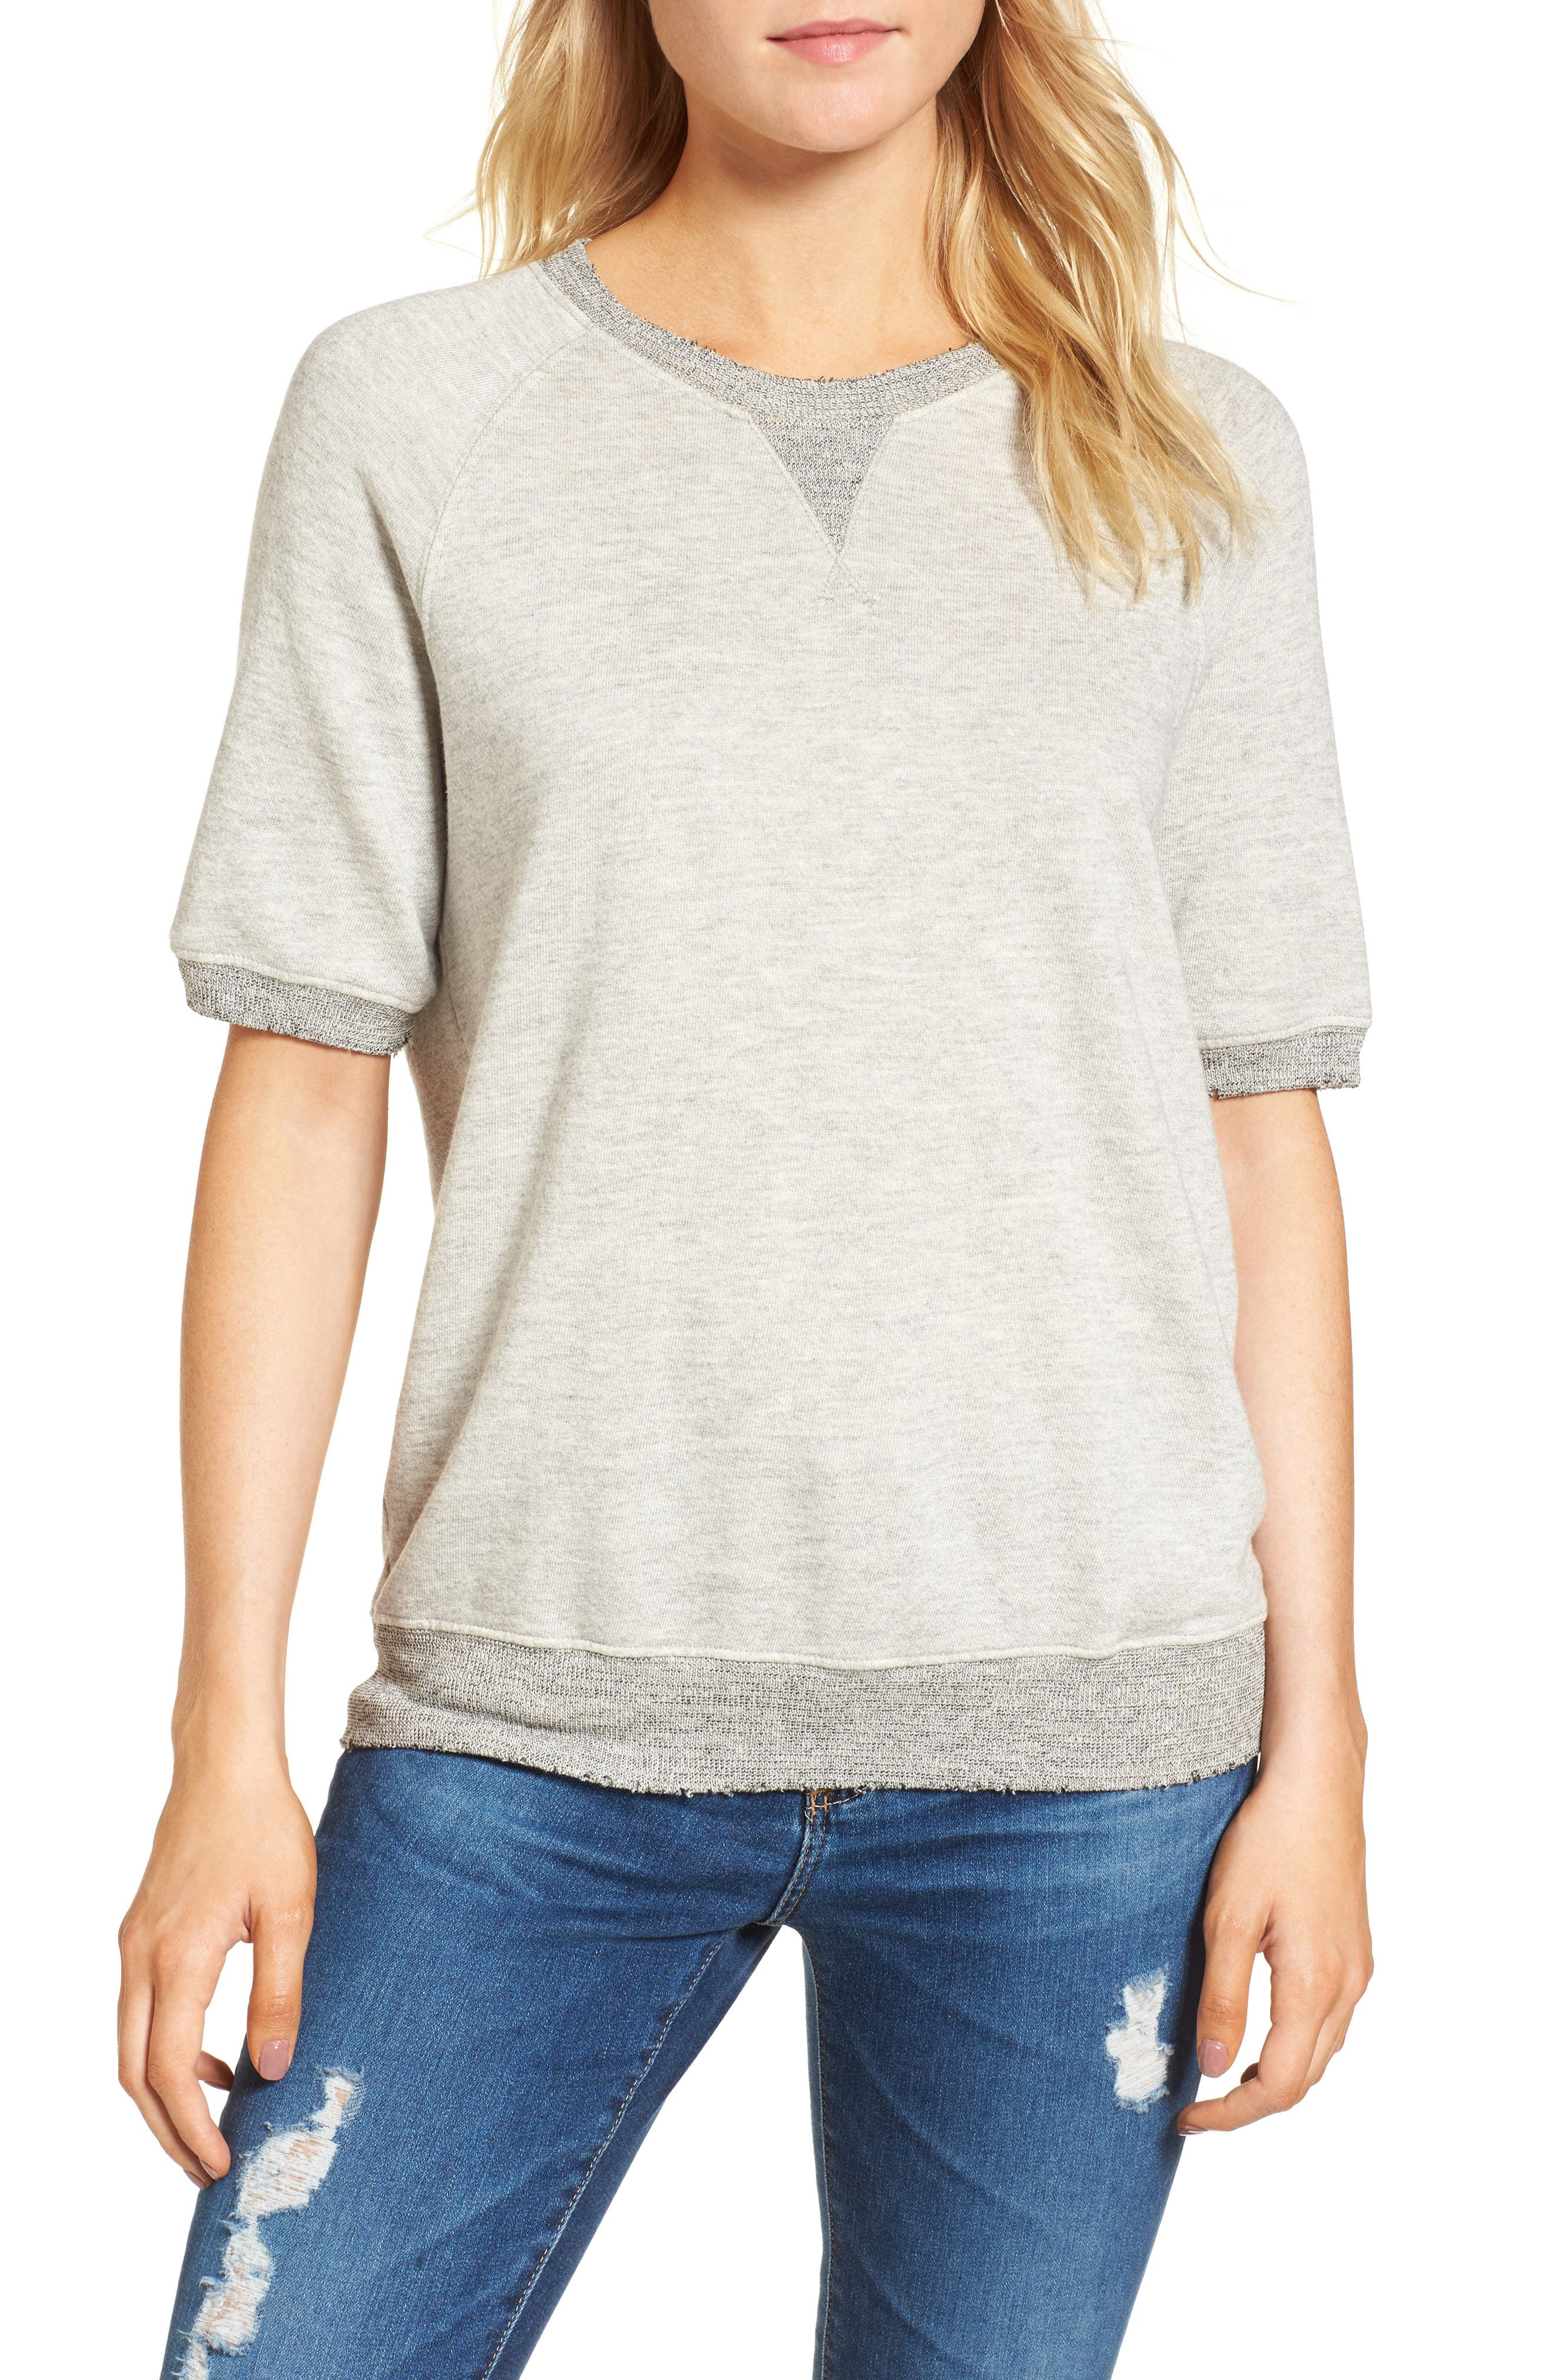 Ace Sweatshirt,                         Main,                         color, Heather Grey